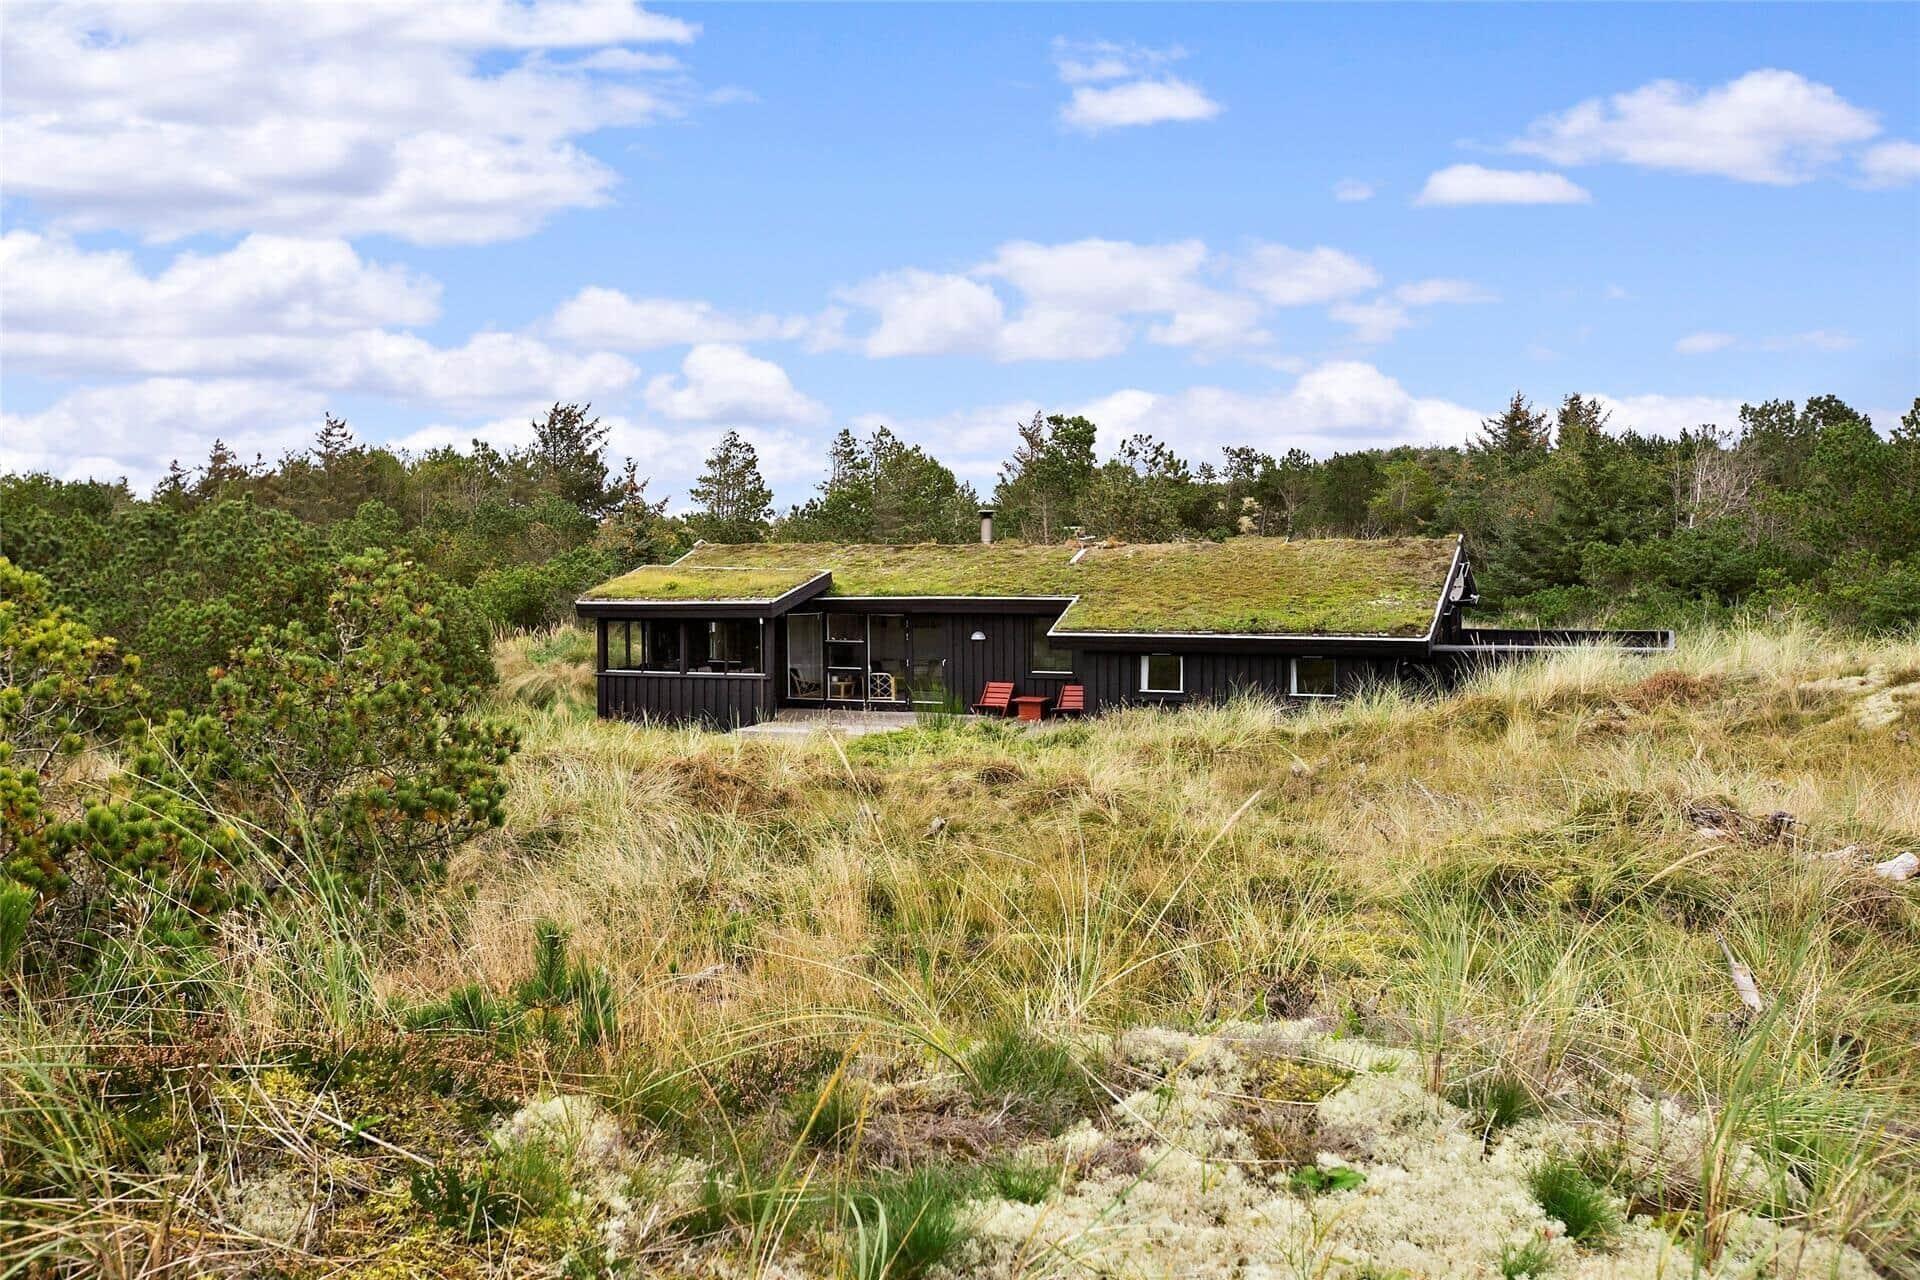 Afbeelding 1-176 Vakantiehuis BL233, Hunetorp Klitvej 63, DK - 9490 Pandrup